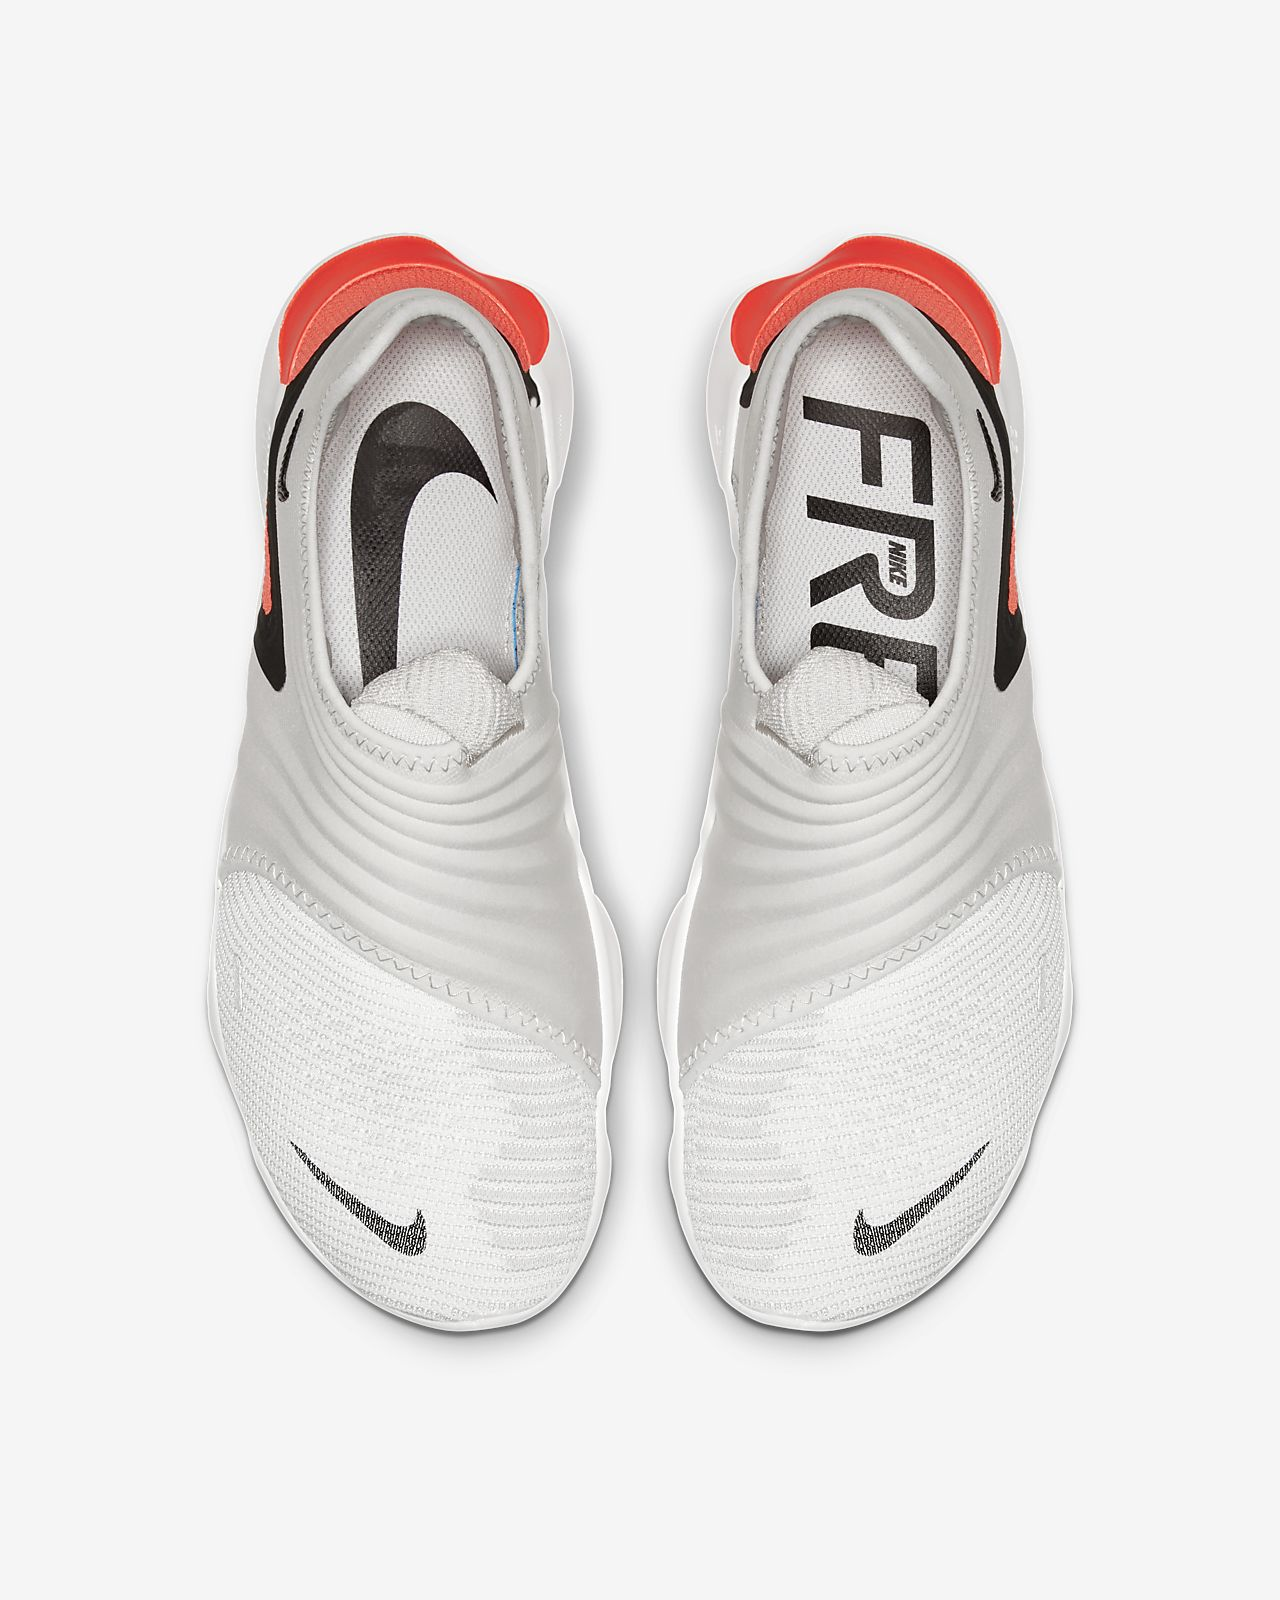 a5d9ff6deeb6 Nike Free RN Flyknit 3.0 Men s Running Shoe. Nike.com